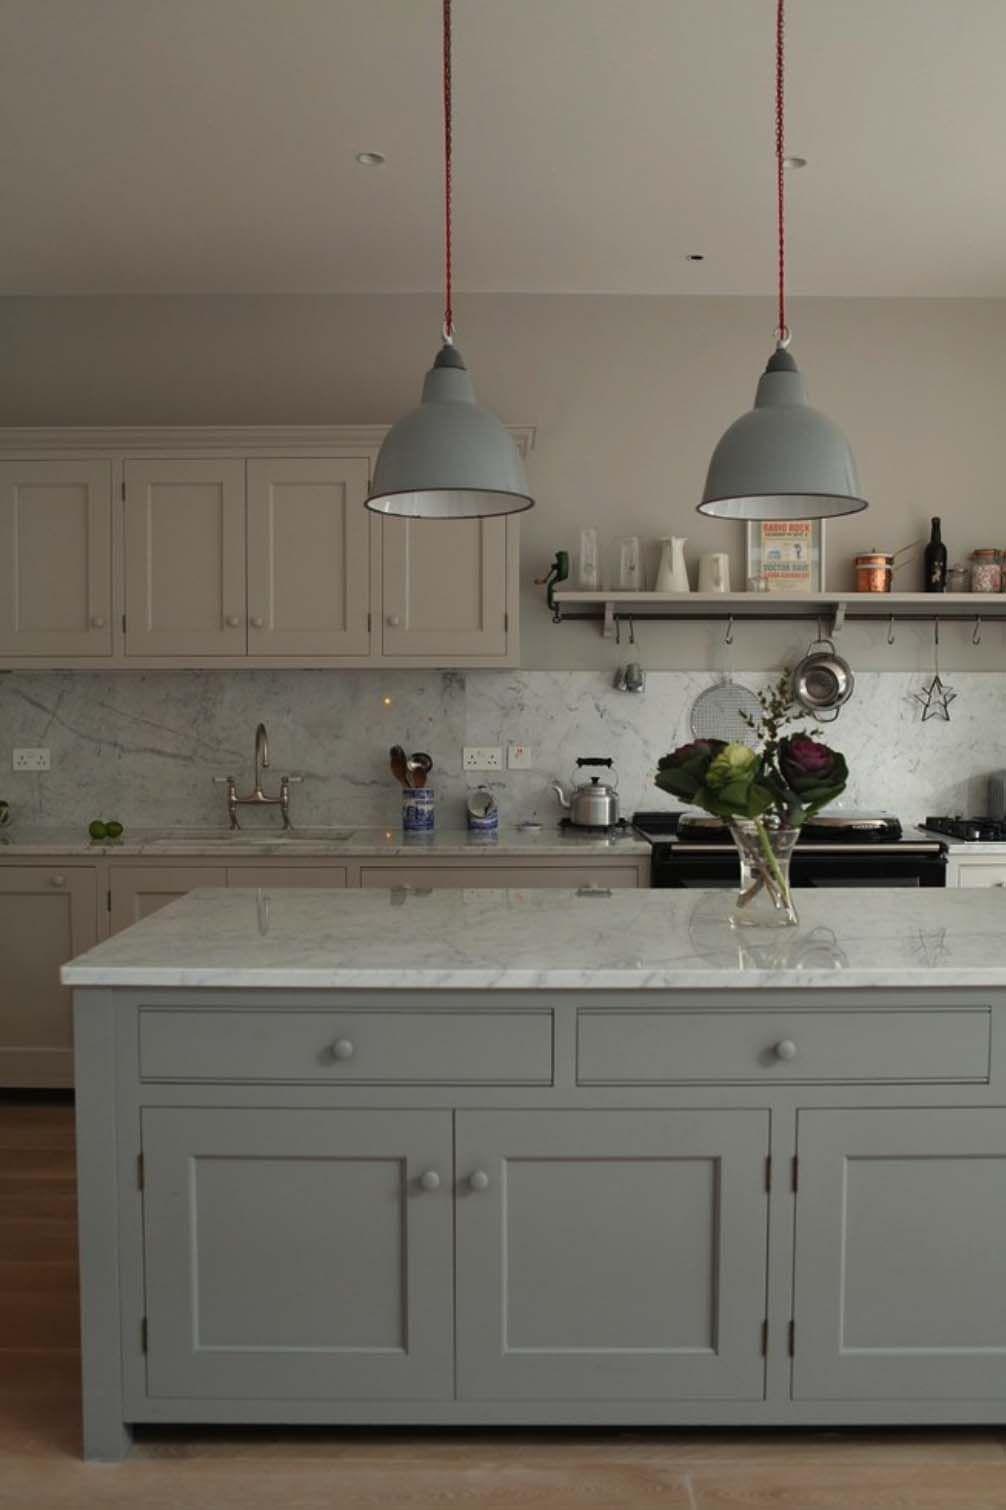 25 Breathtaking Carrara Marble Kitchens For Your Inspiration Carrara Marble Kitchen Kitchen Marble Kitchen Interior